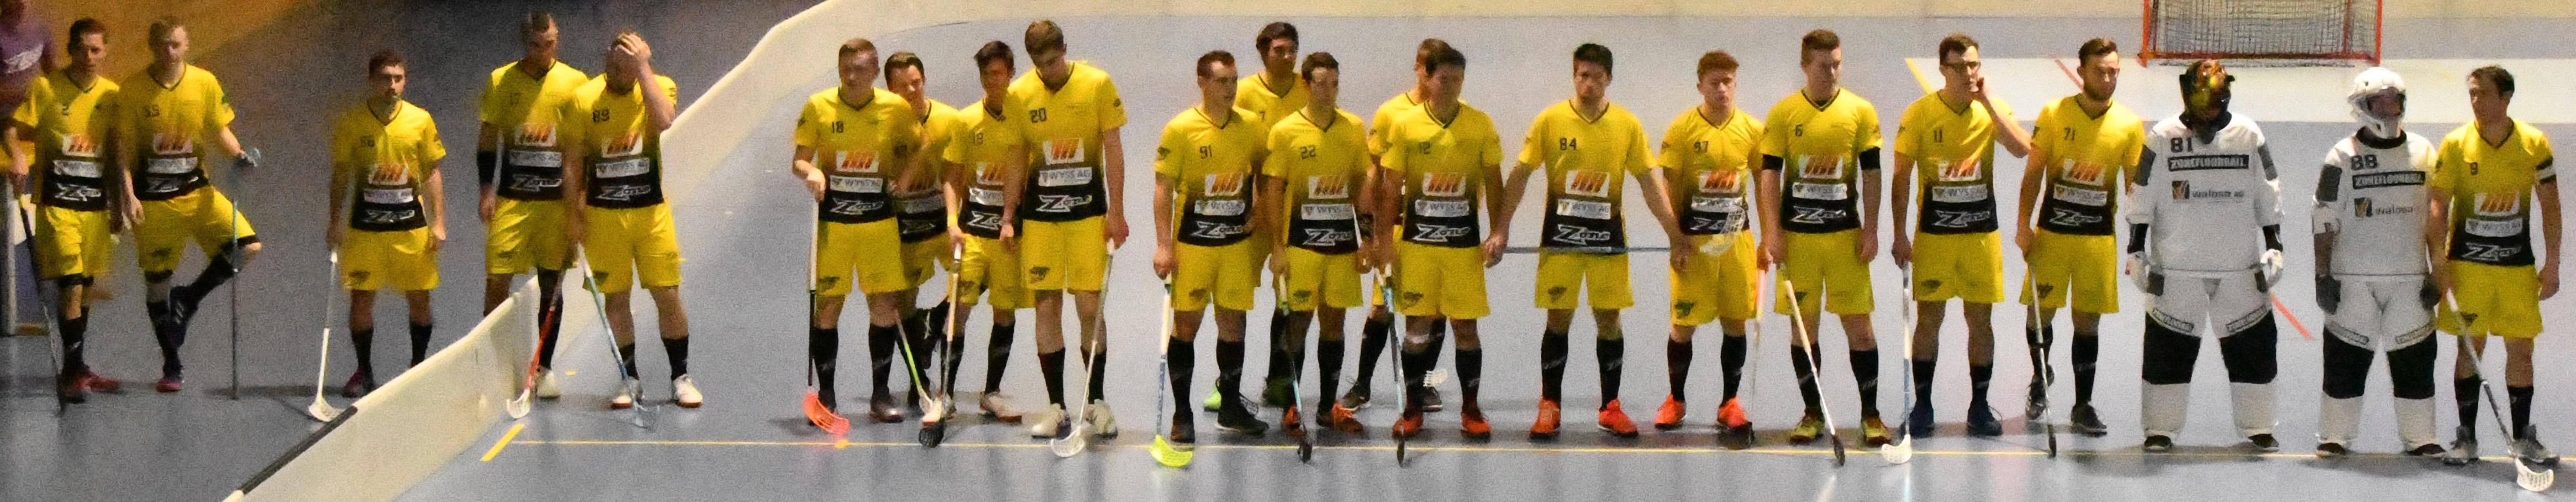 Herren - TSV Unihockey Deitingen Saison 2018/19